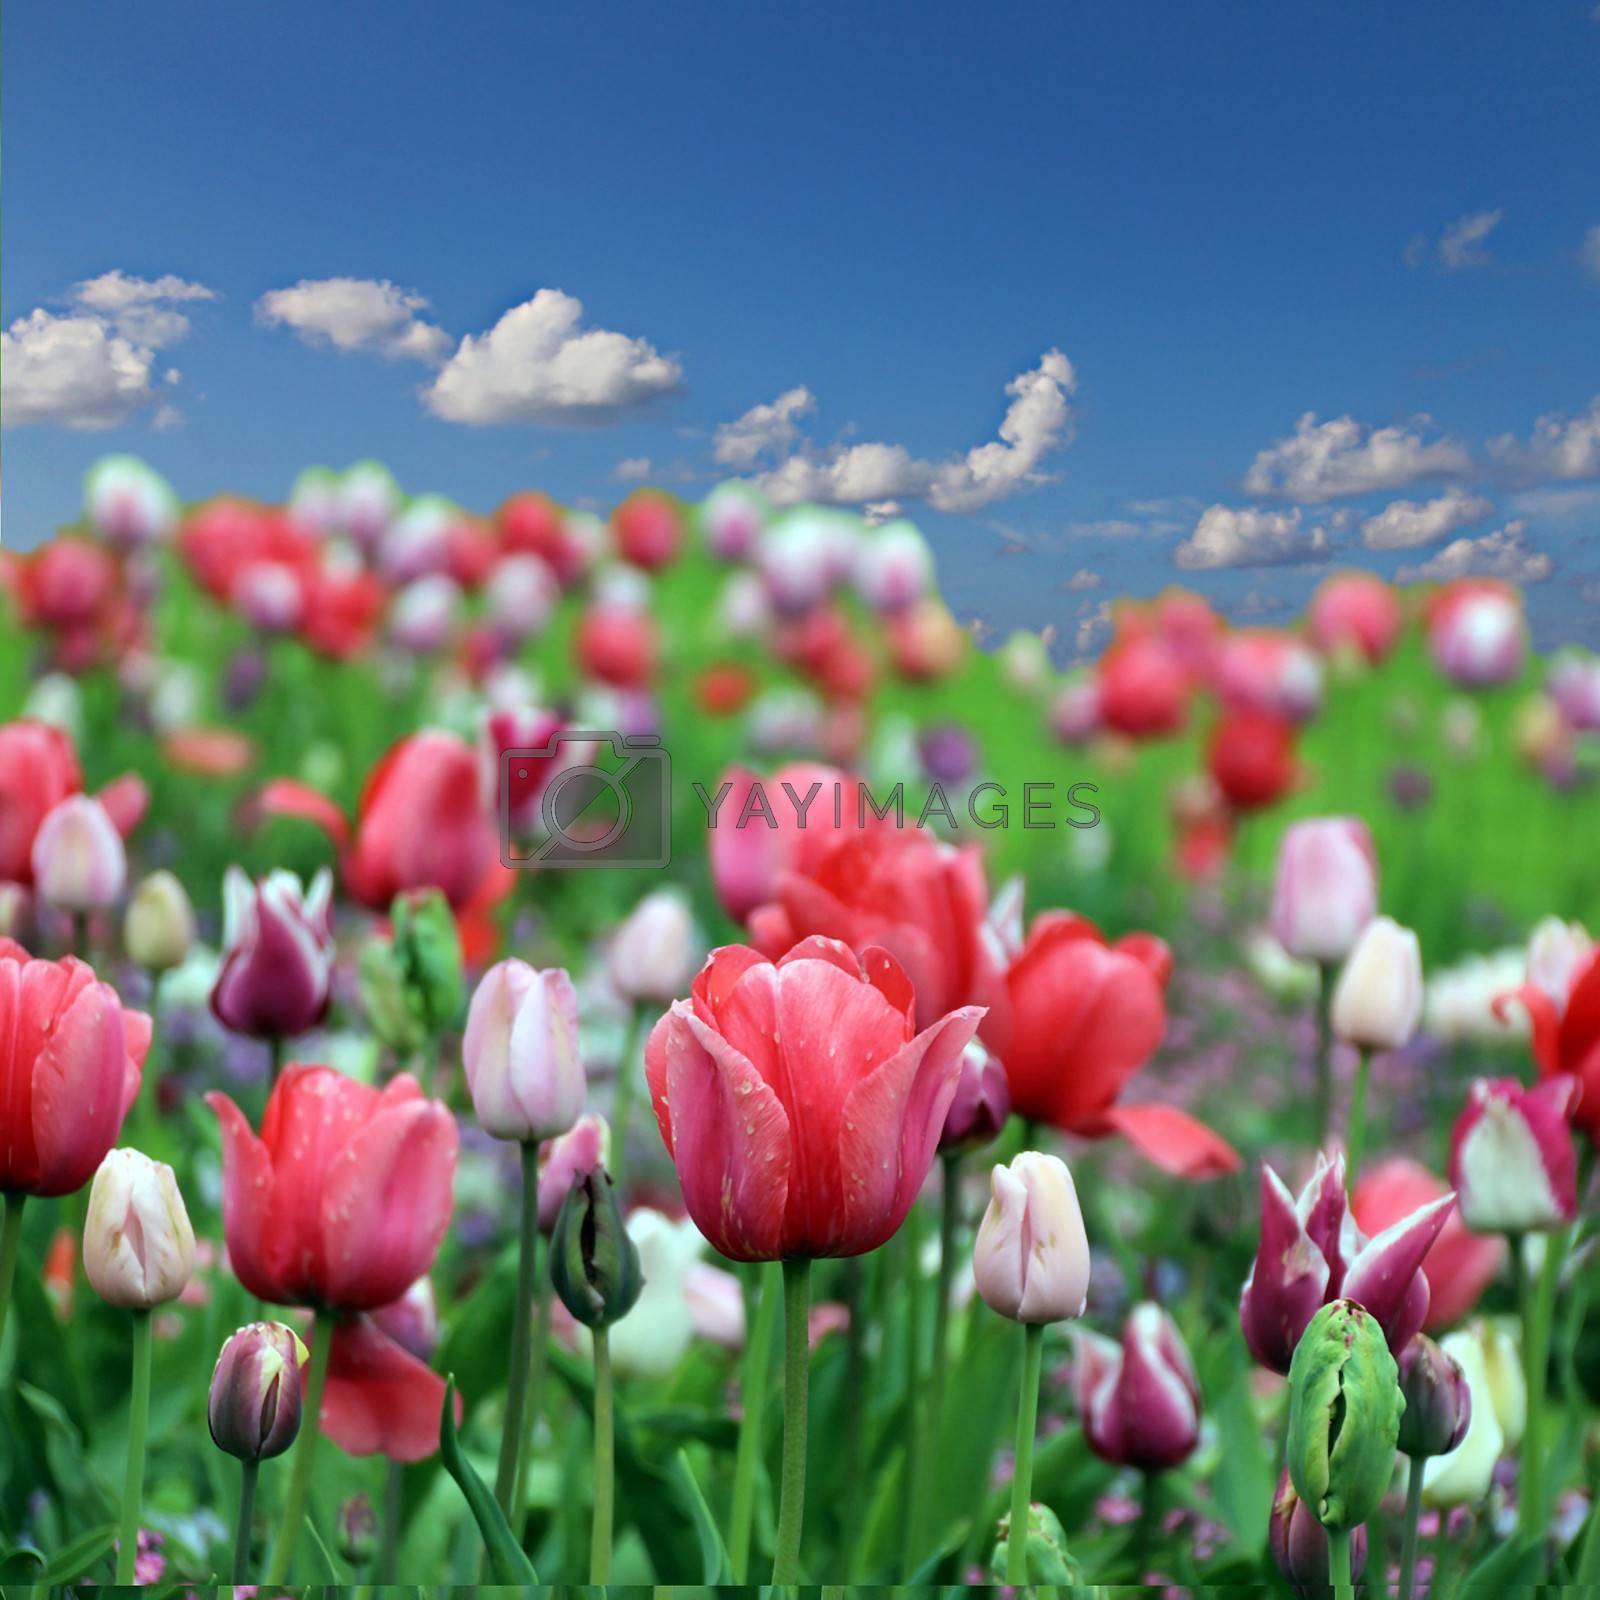 Spring tulip flowers on blue sky background